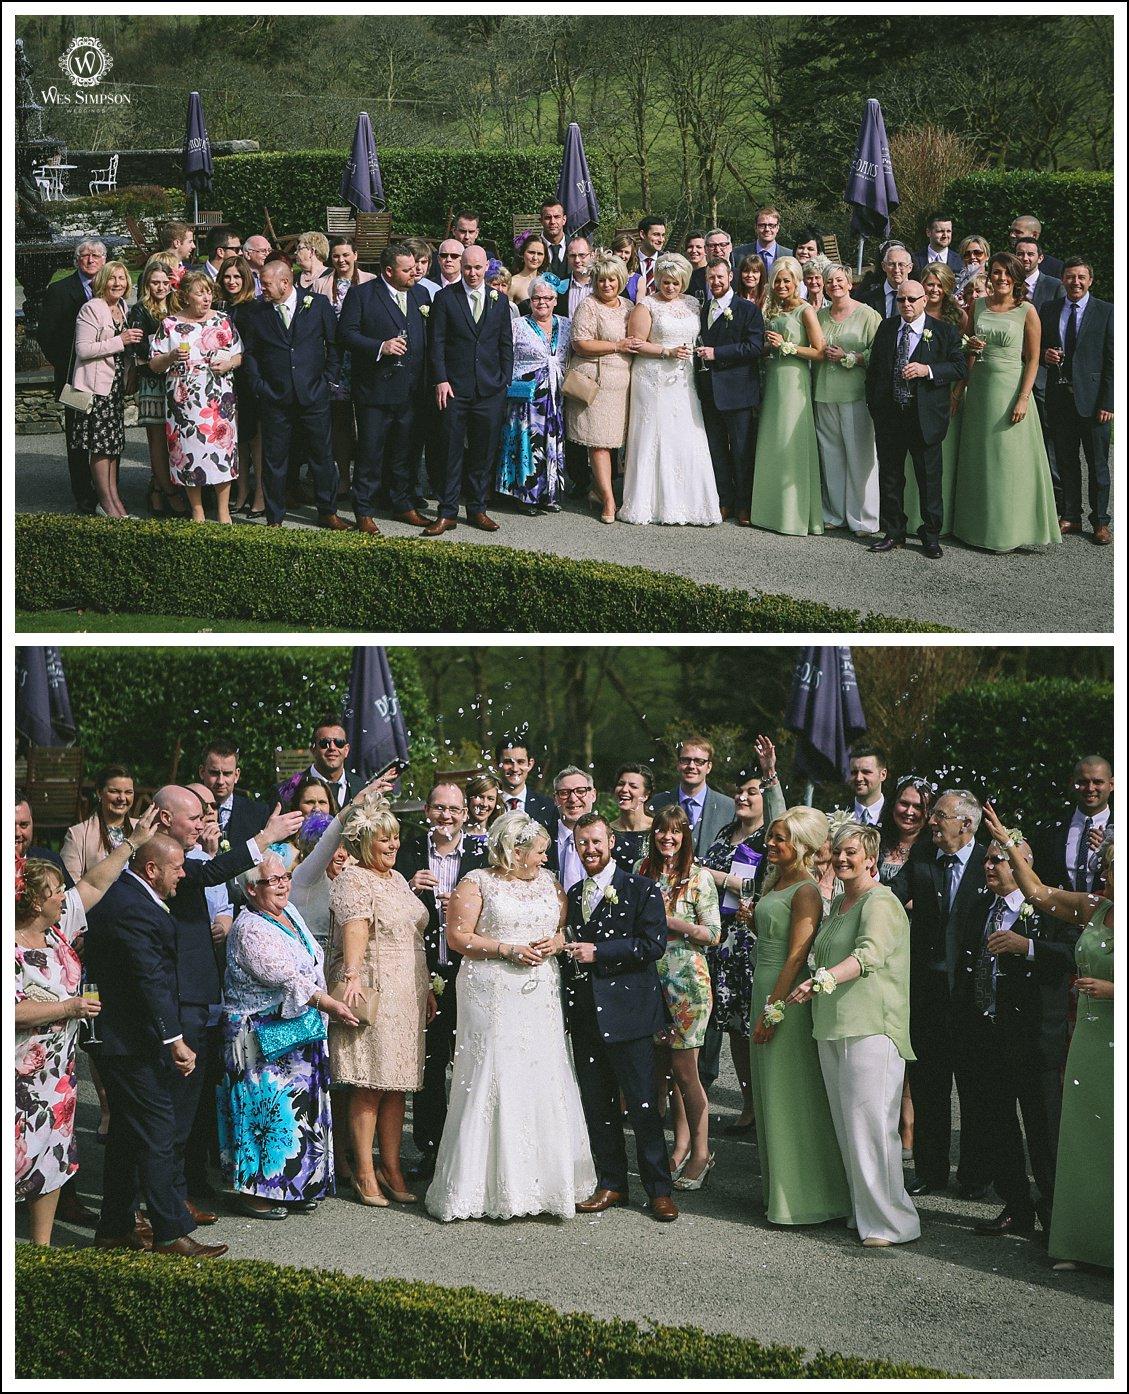 Broadoaks wedding venue, Lake District wedding photographer, Windermere, Wes Simpson photography_0042